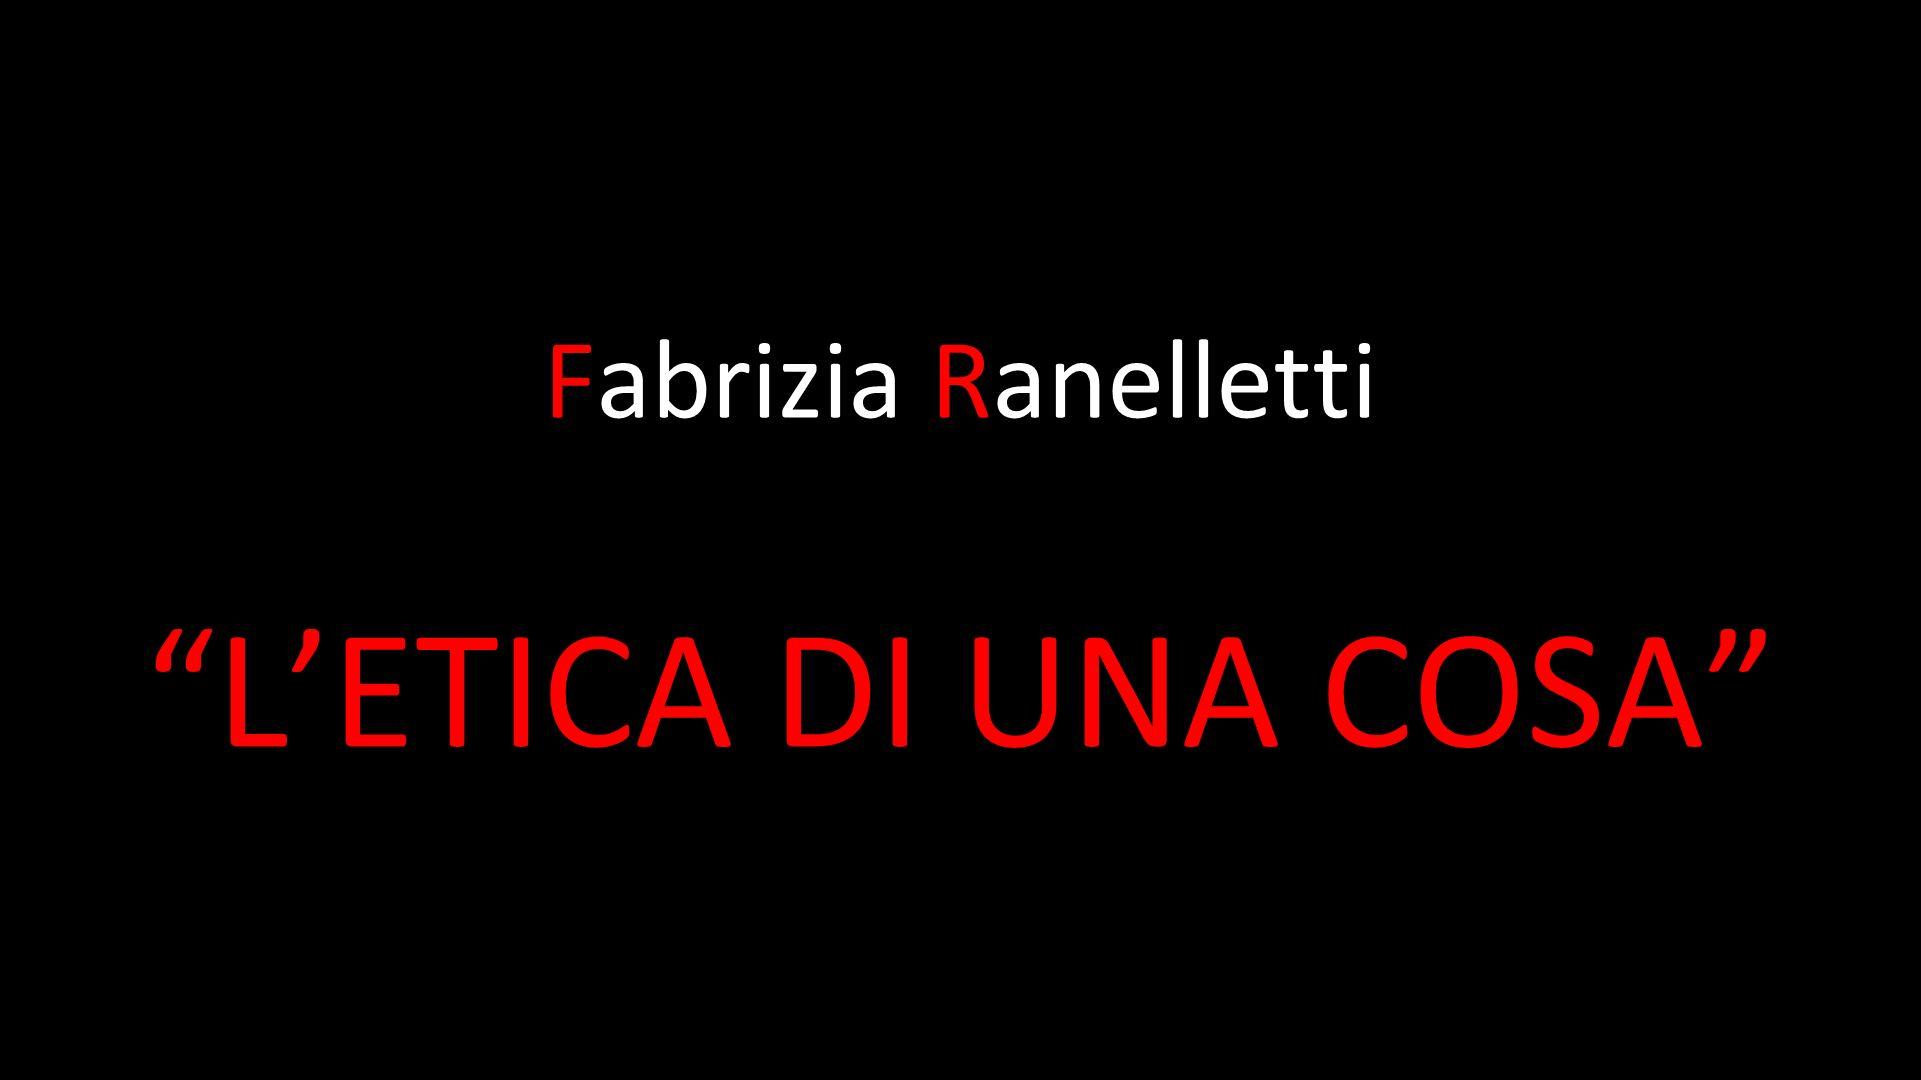 Paolo Viterbini